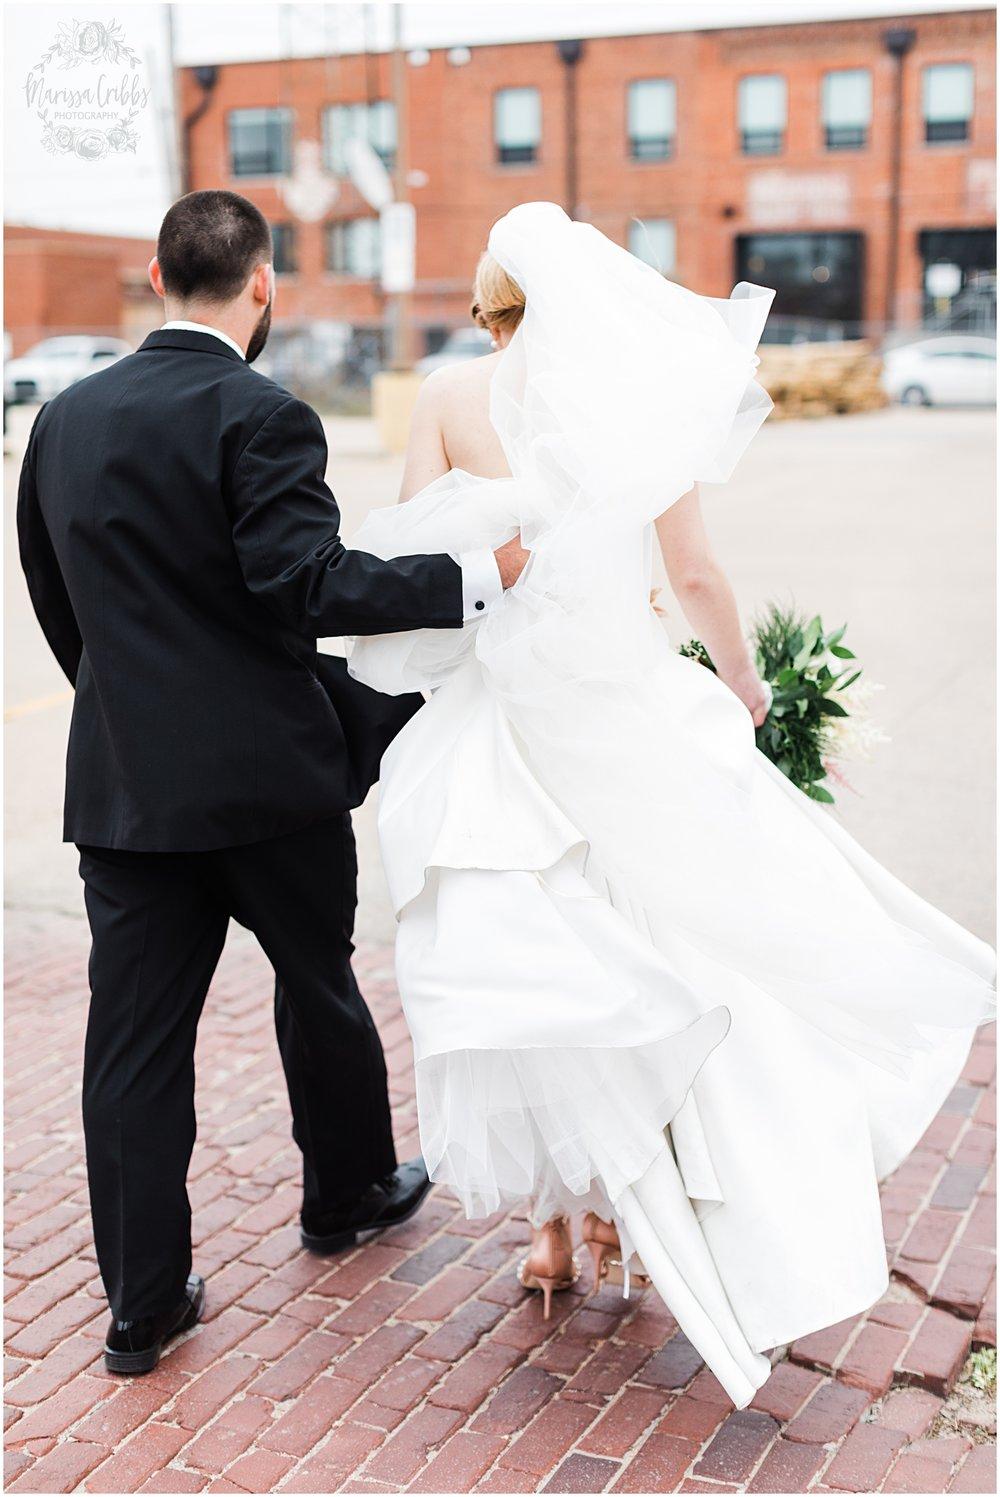 ABBY & CHARLIE WEDDING   THE HUDSON EVENT SPACE WEDDING   MARISSA CRIBBS PHOTOGRAPHY_7545.jpg